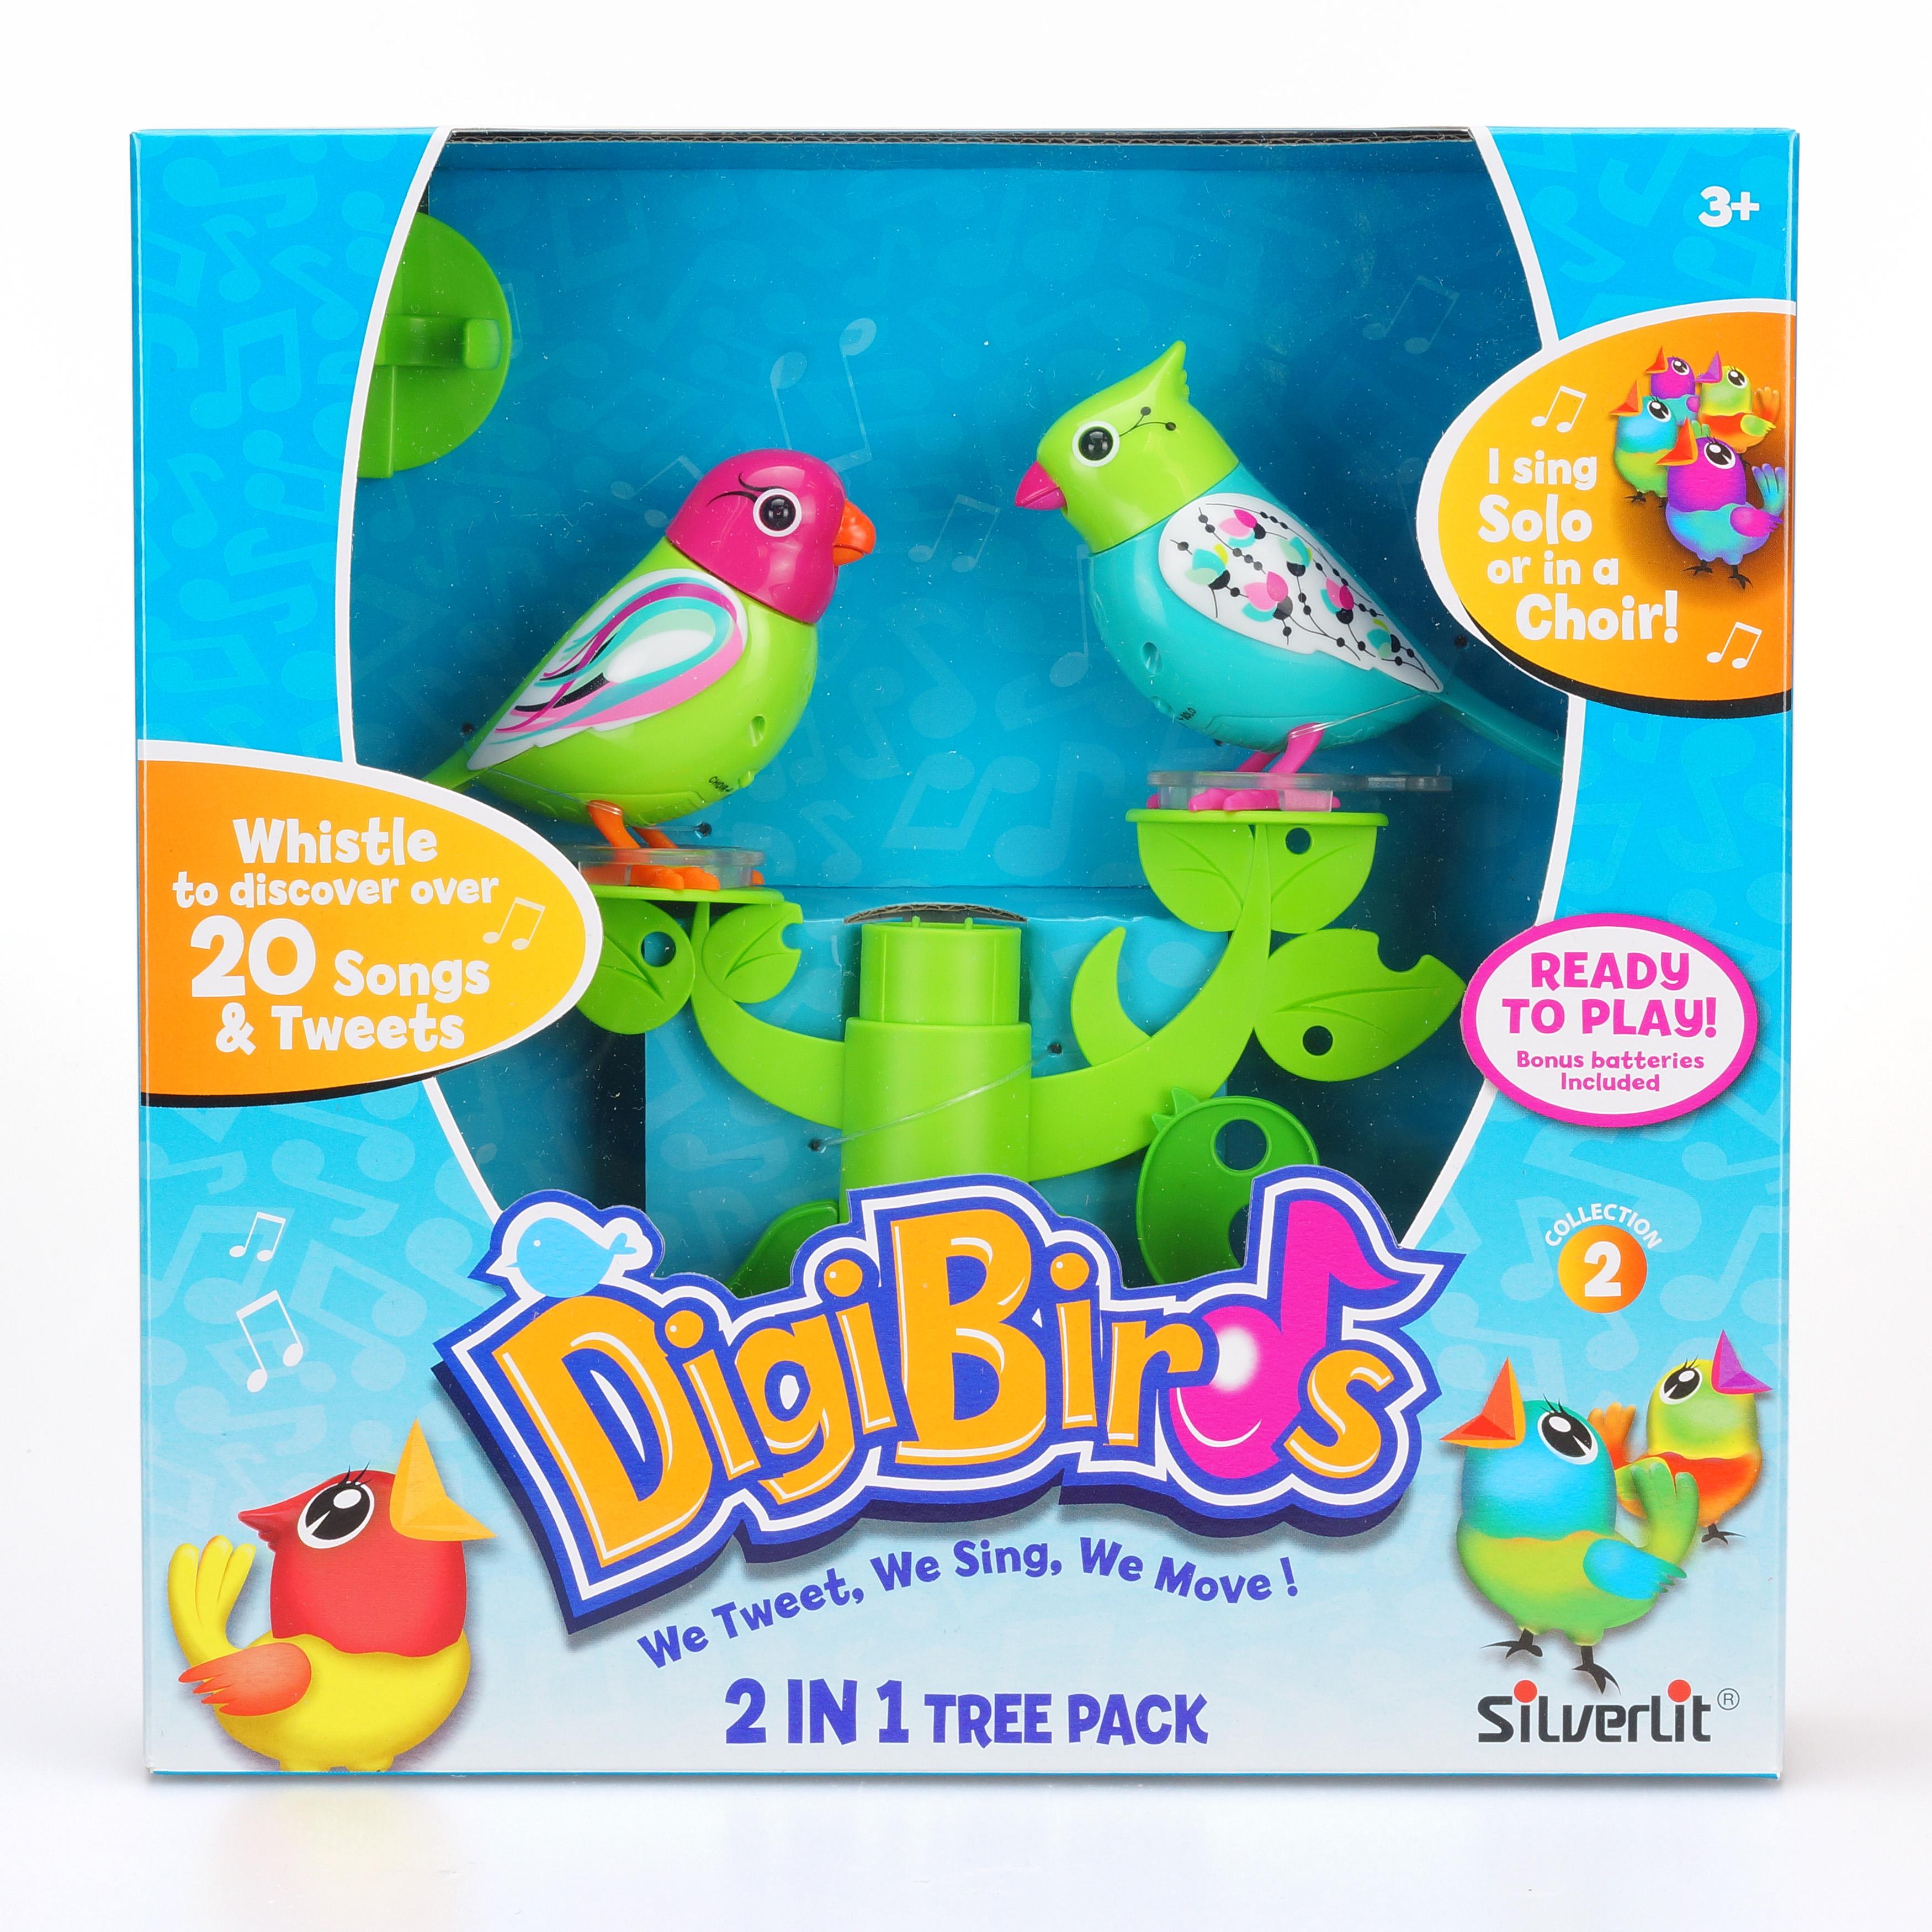 Silverlit. Две птички с деревом DigiFriends-DigiBirdsСкидки до 70%<br>Silverlit. Две птички с деревом DigiFriends-DigiBirds<br>